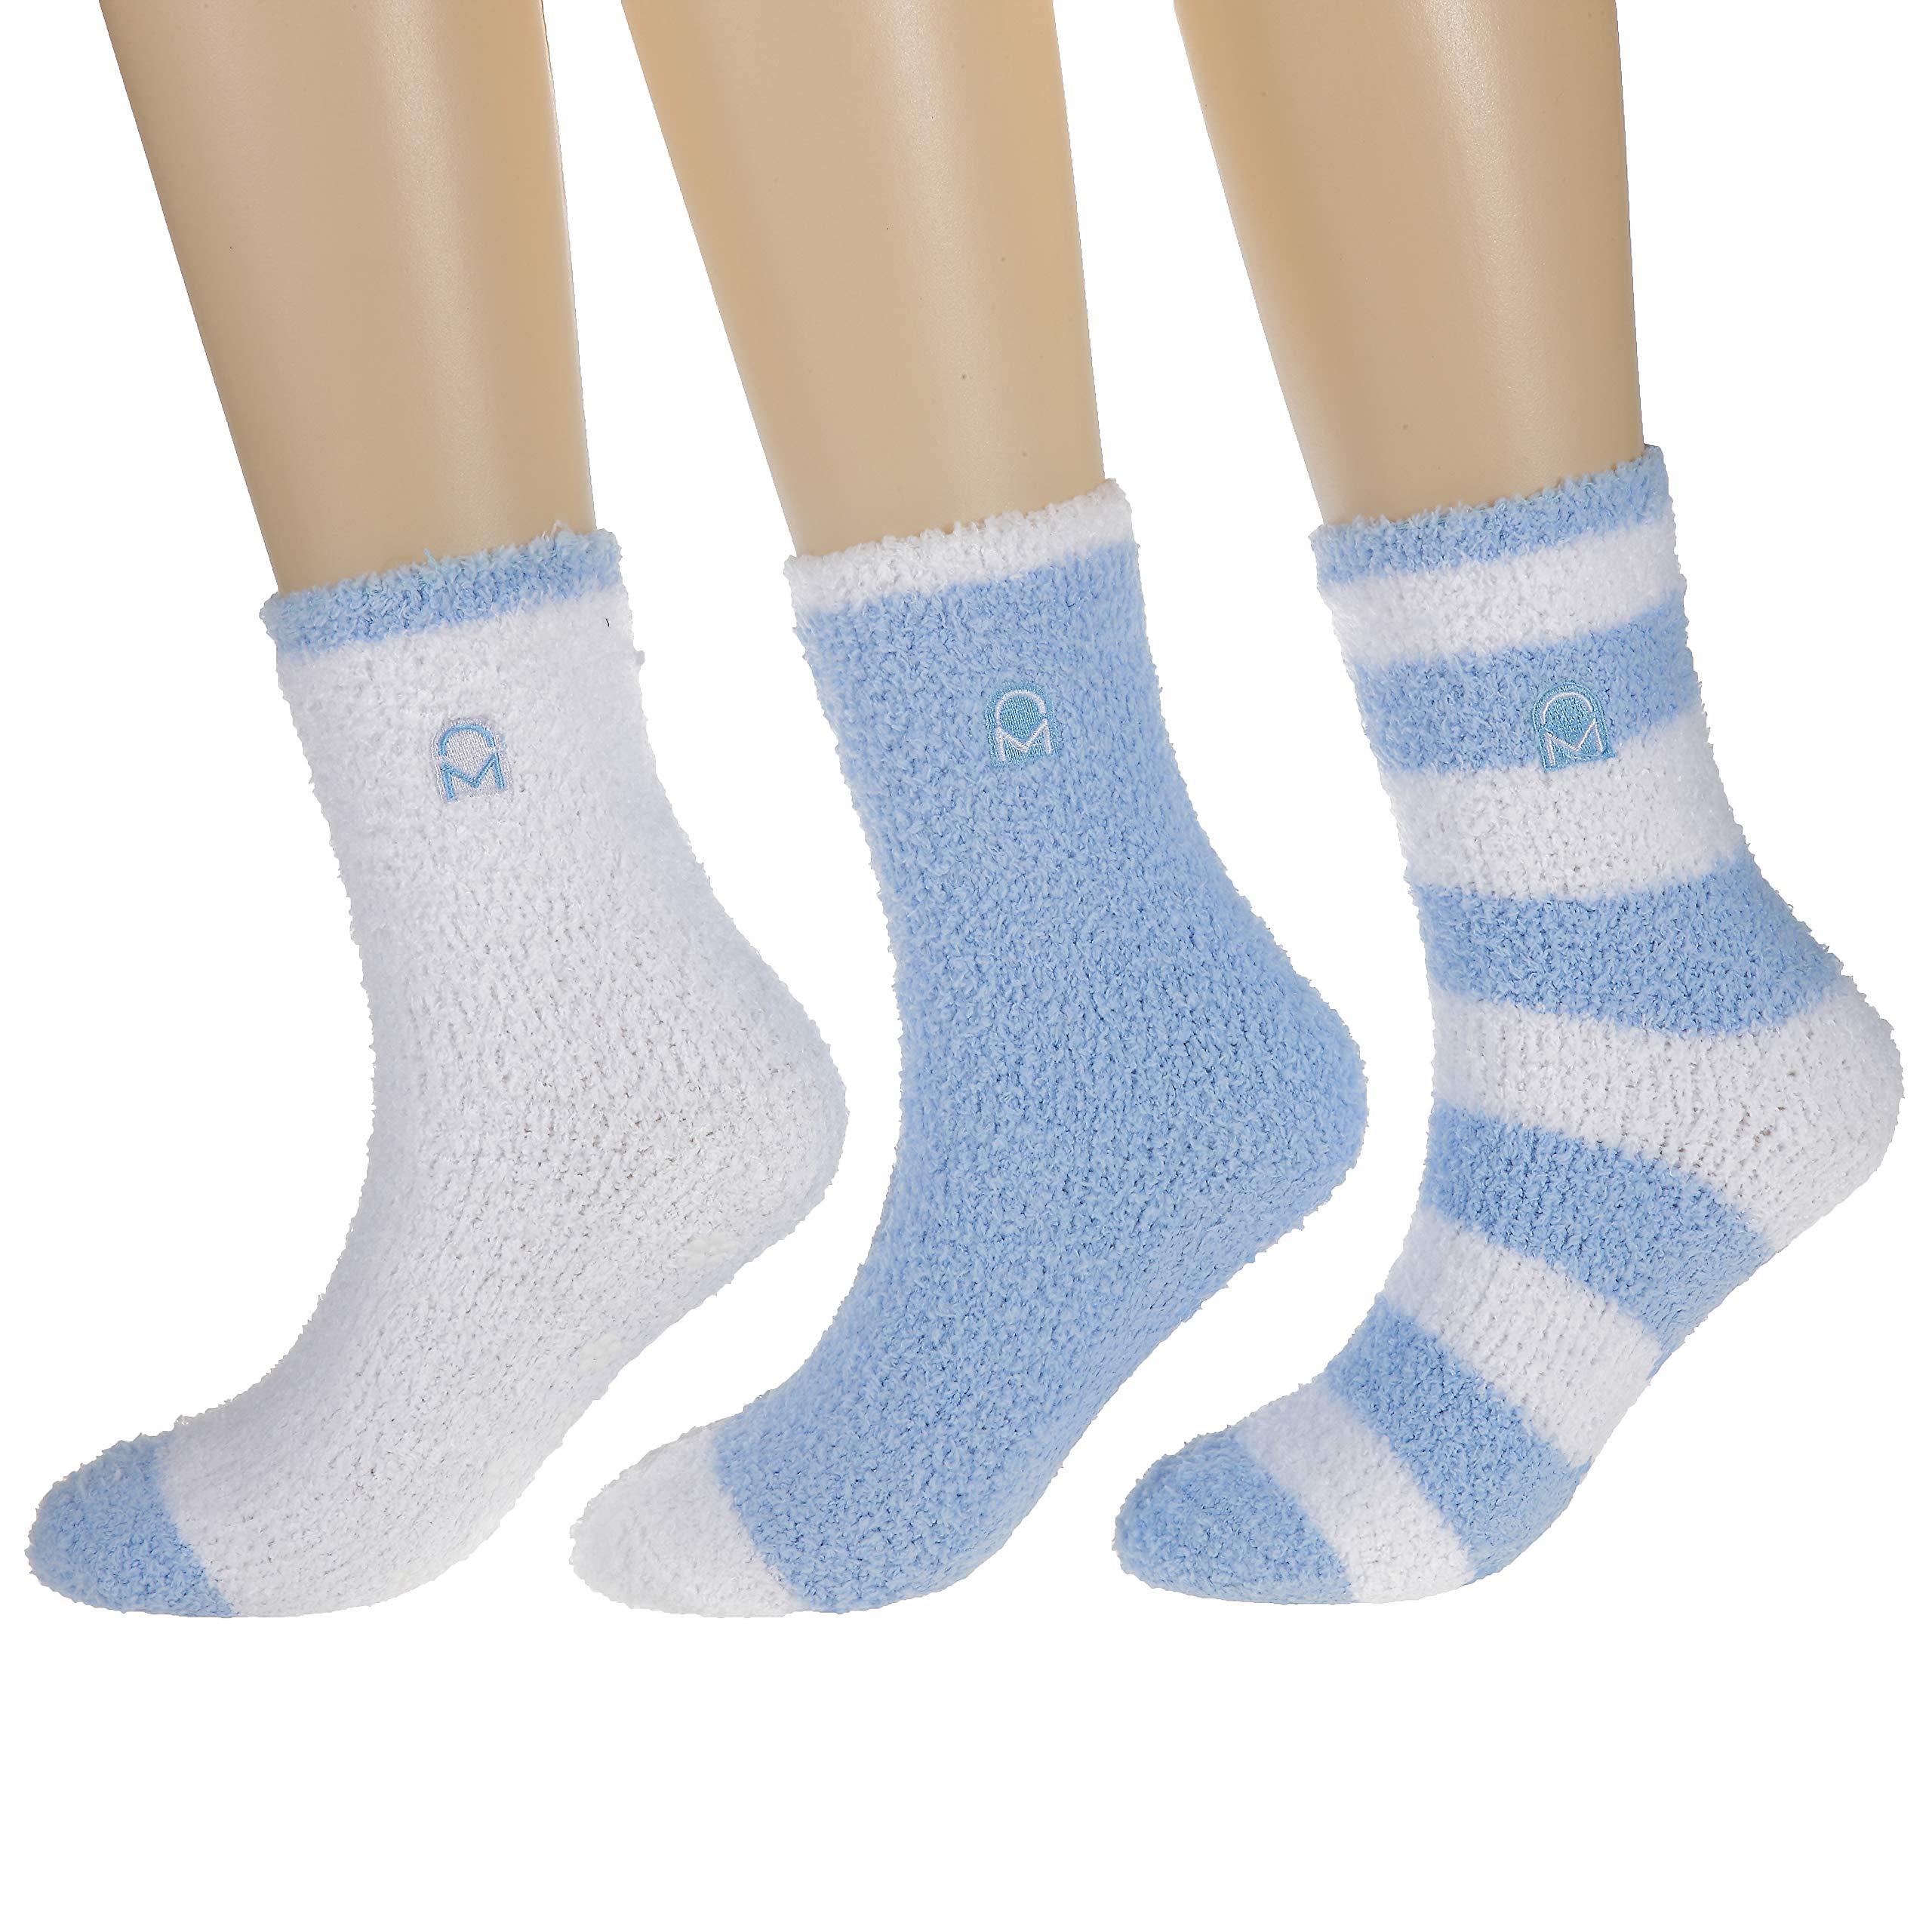 Noble Mount Women's (3 Pairs) Soft Anti-Skid Fuzzy Winter Crew Socks